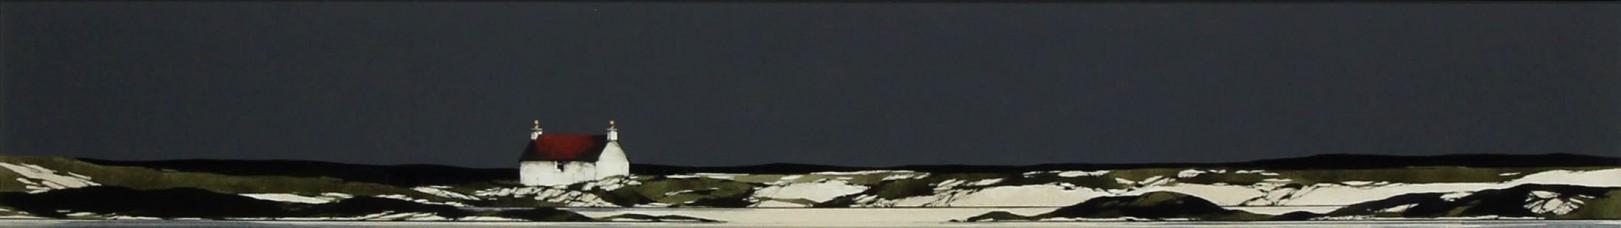 Ron Lawson _Original_Watercolour and Gouache_Arisaig Coast_image 6x38.5